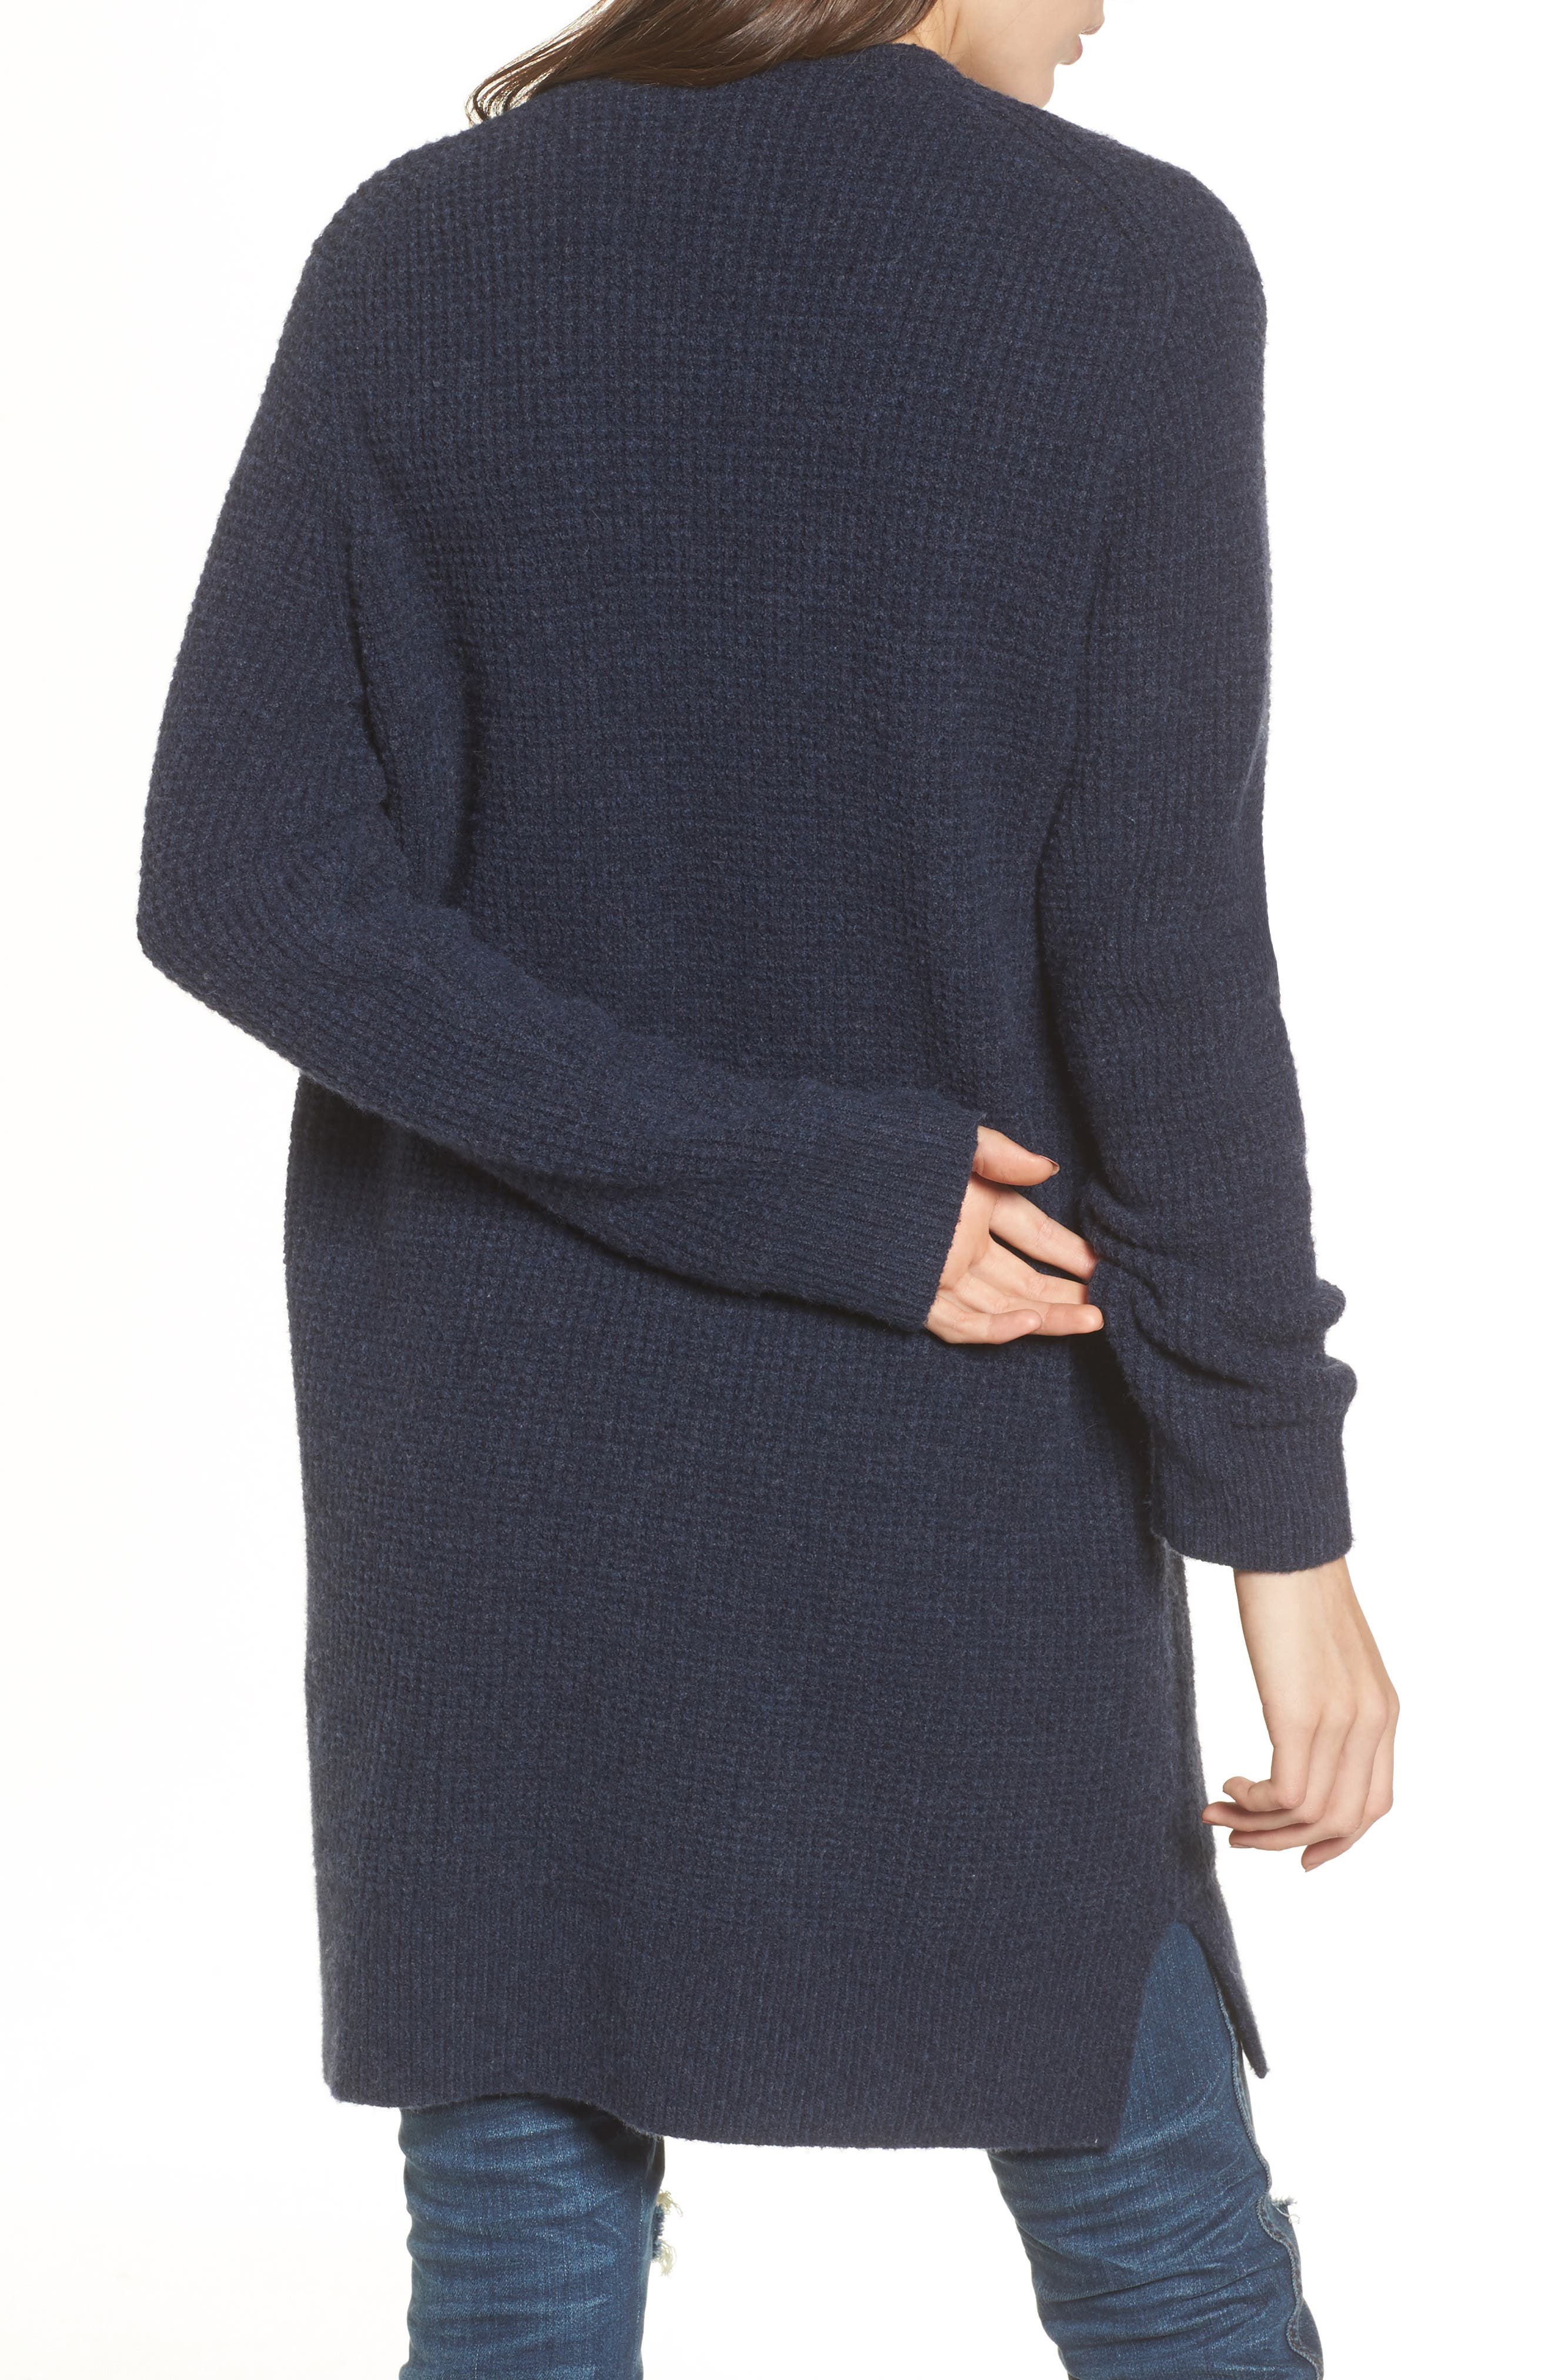 Alternate Image 2  - Madewell Waffle Stitch Cardigan Sweater